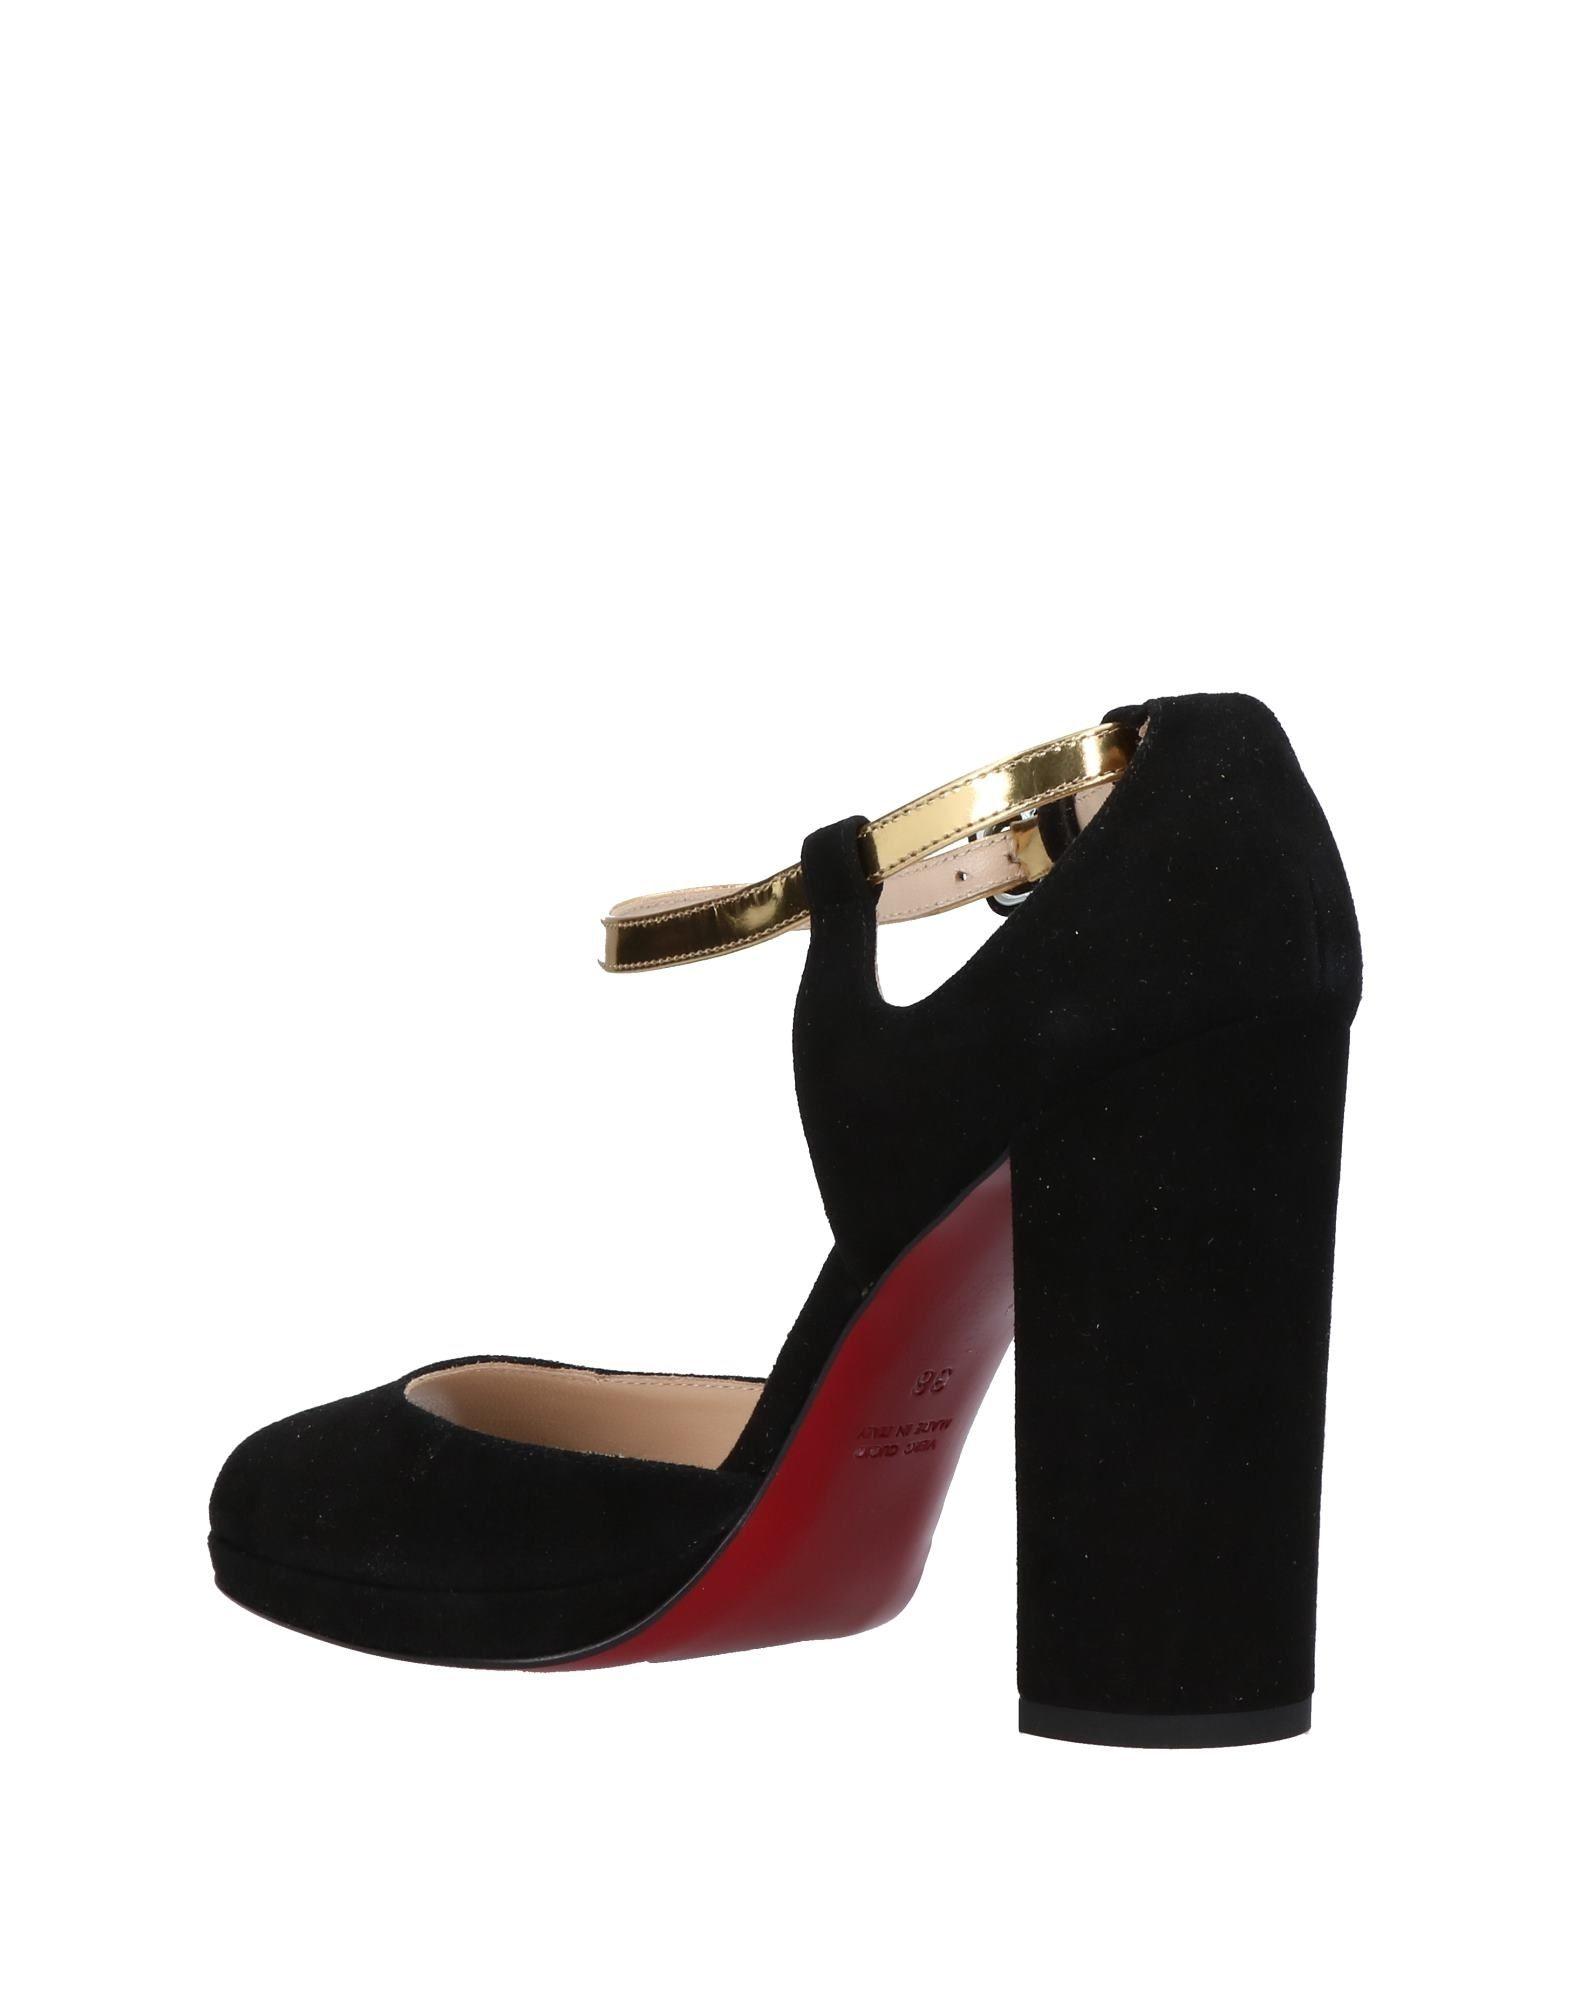 Franco Colli Qualität Sandalen Damen  11380253BI Gute Qualität Colli beliebte Schuhe f0719e